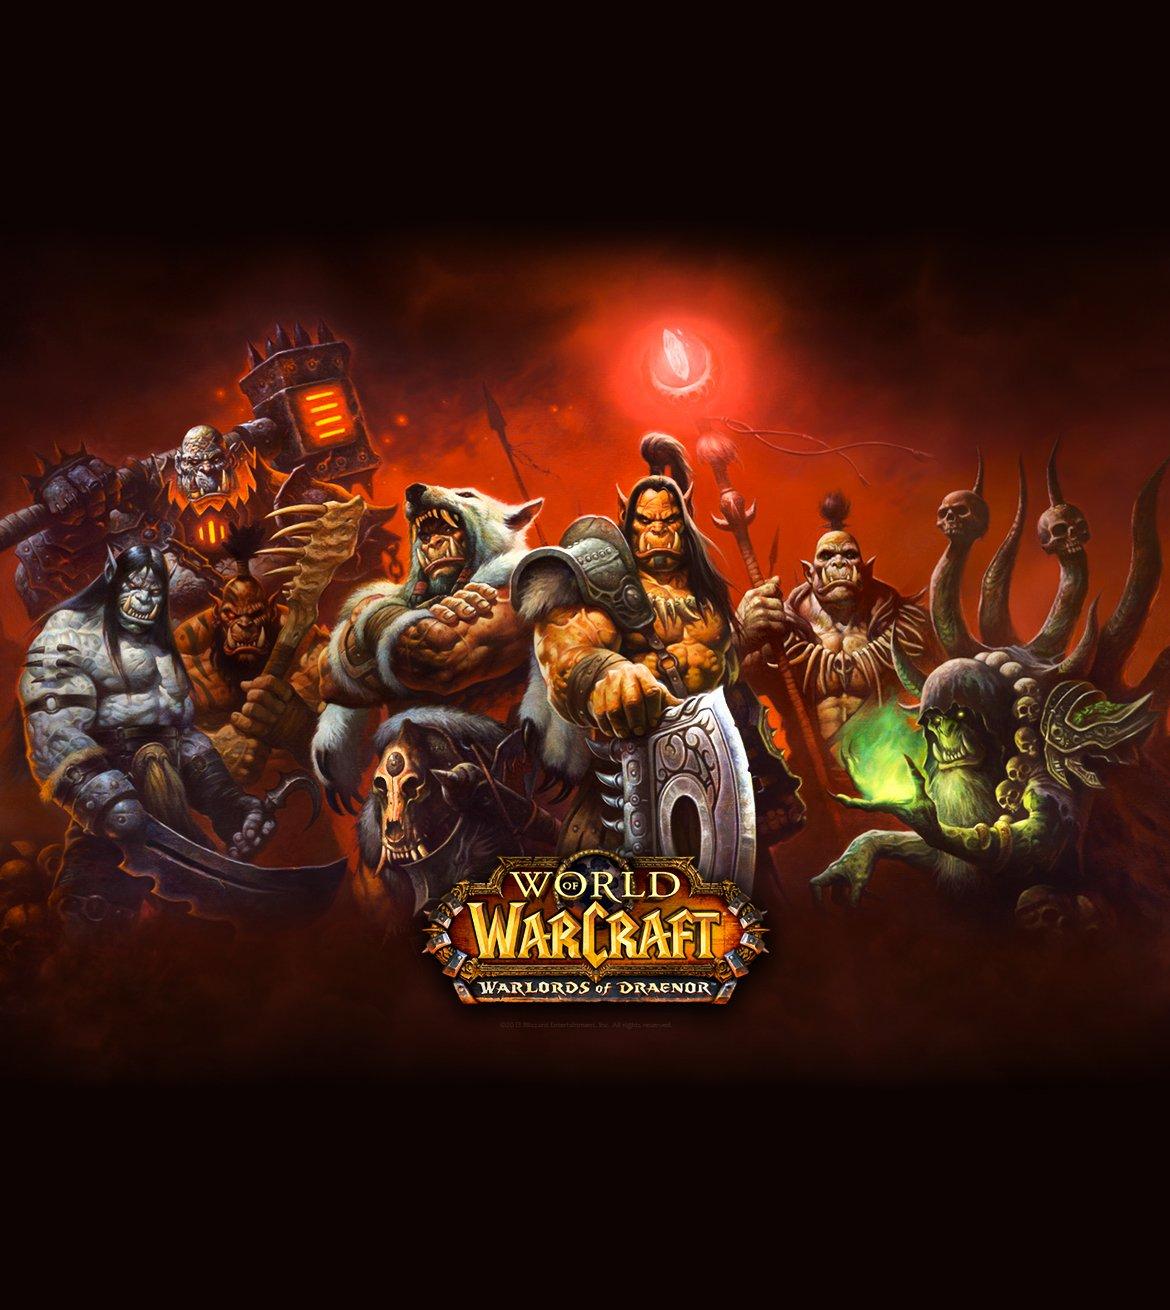 Warlords of Draenor Tumblr